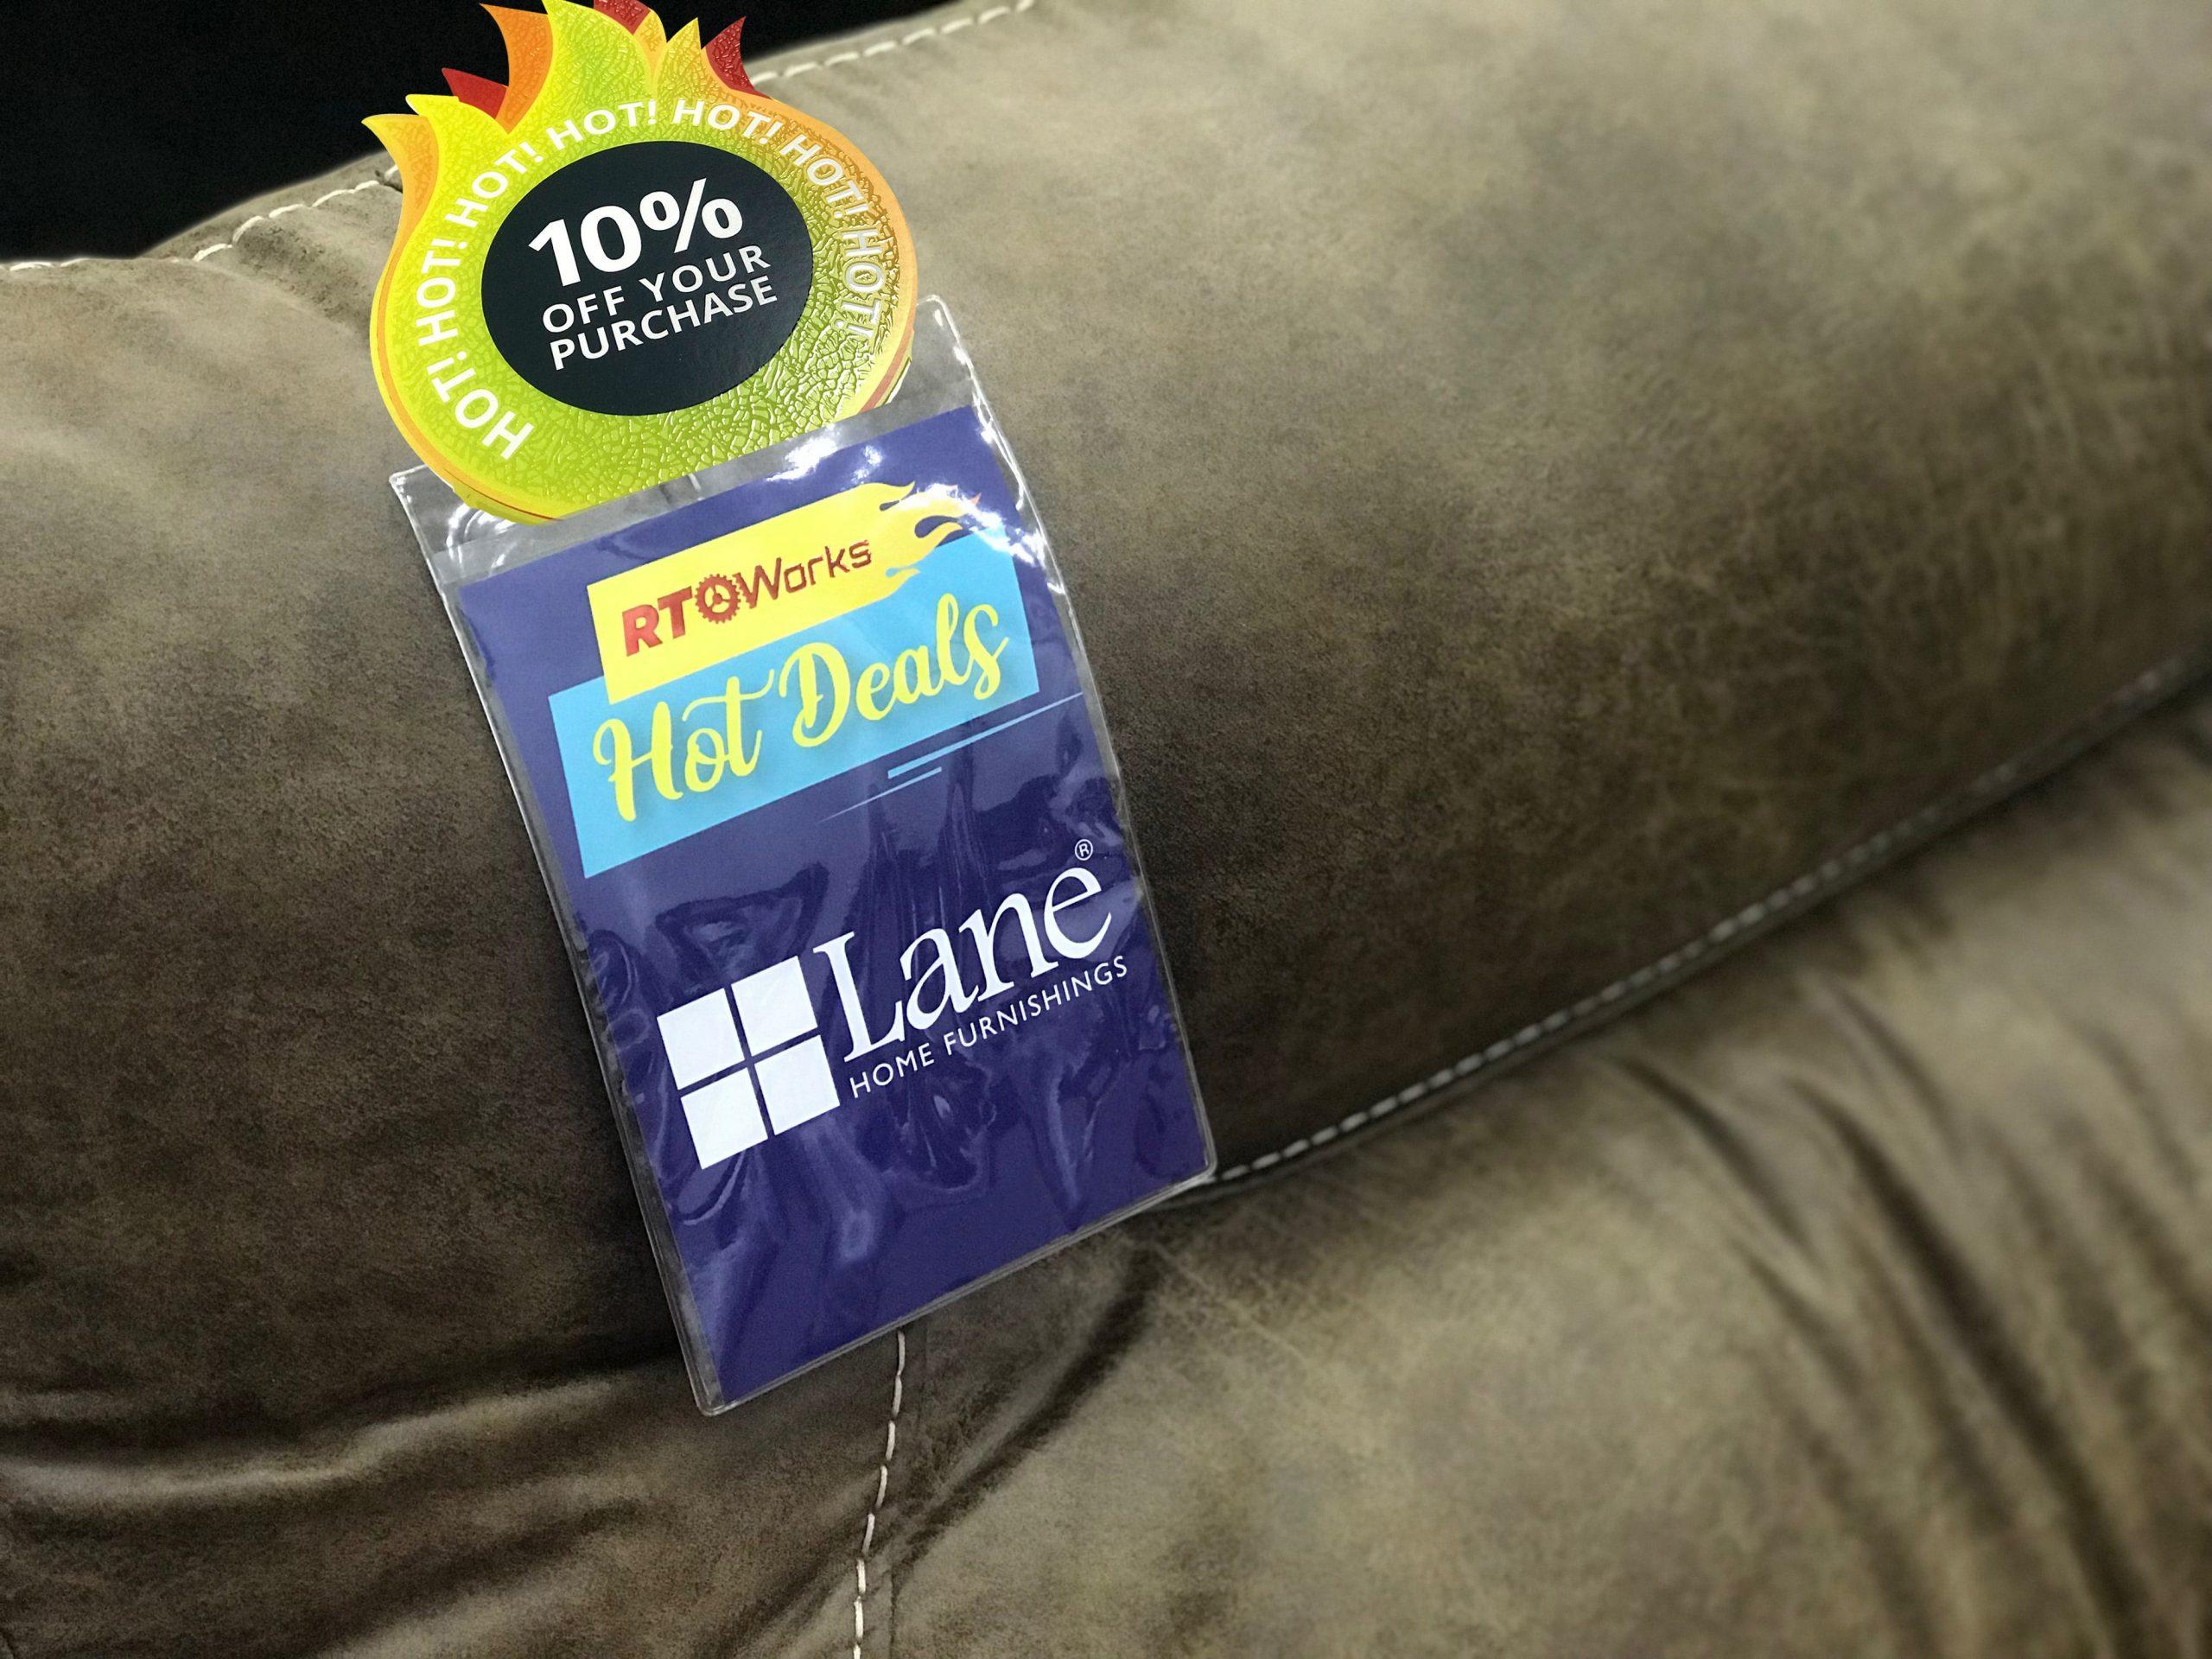 Lane Home Furnishings custom 10% off tag